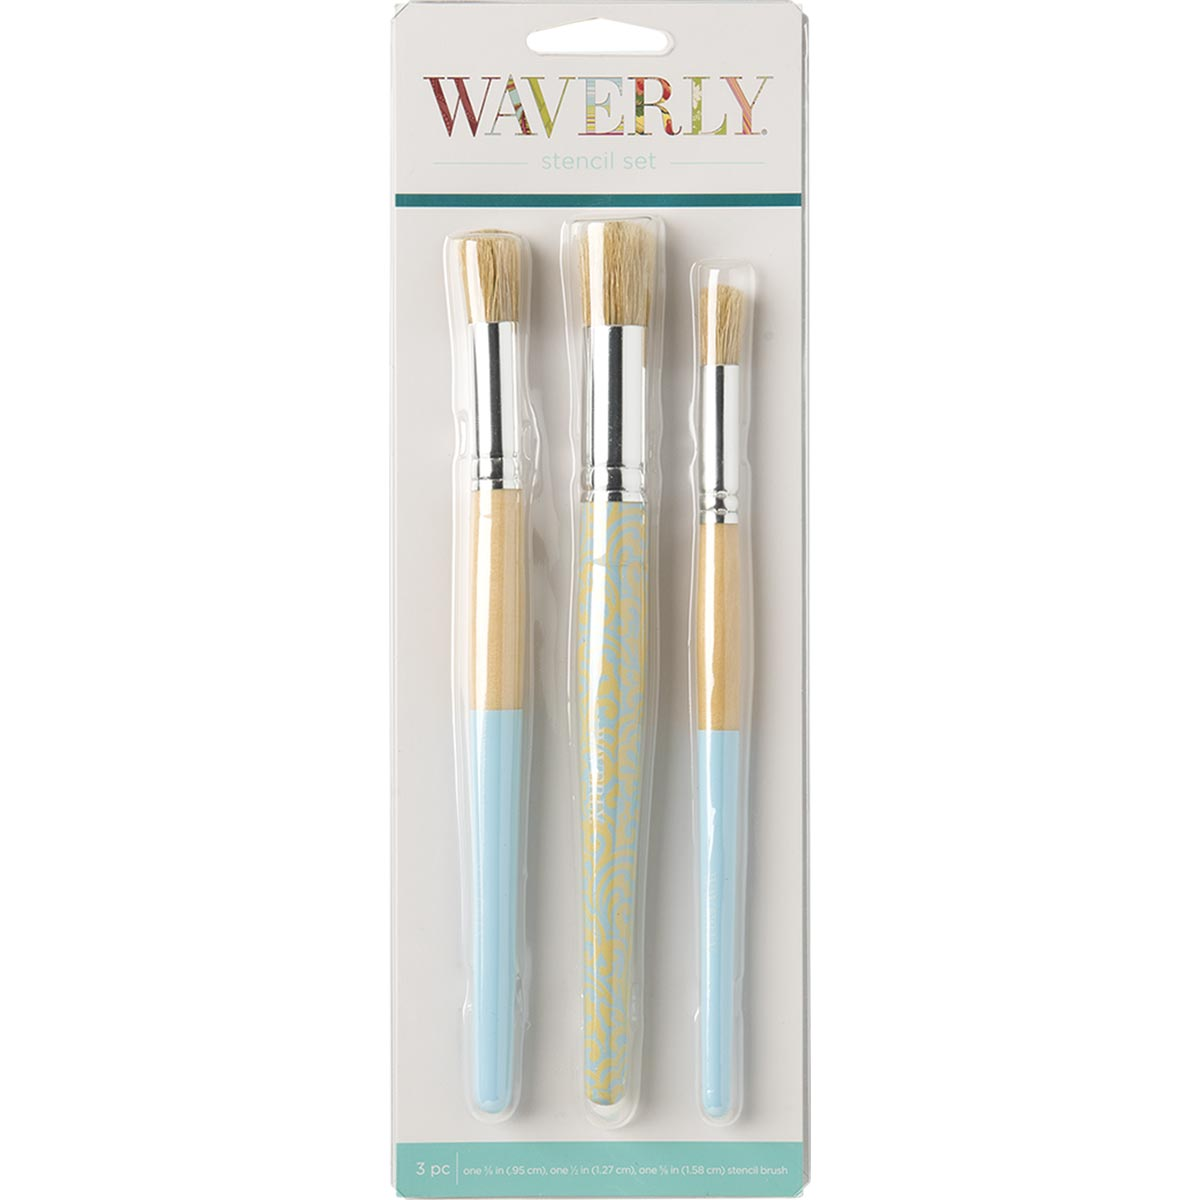 Waverly ® Brushes - Stencil Set, 3 pc.